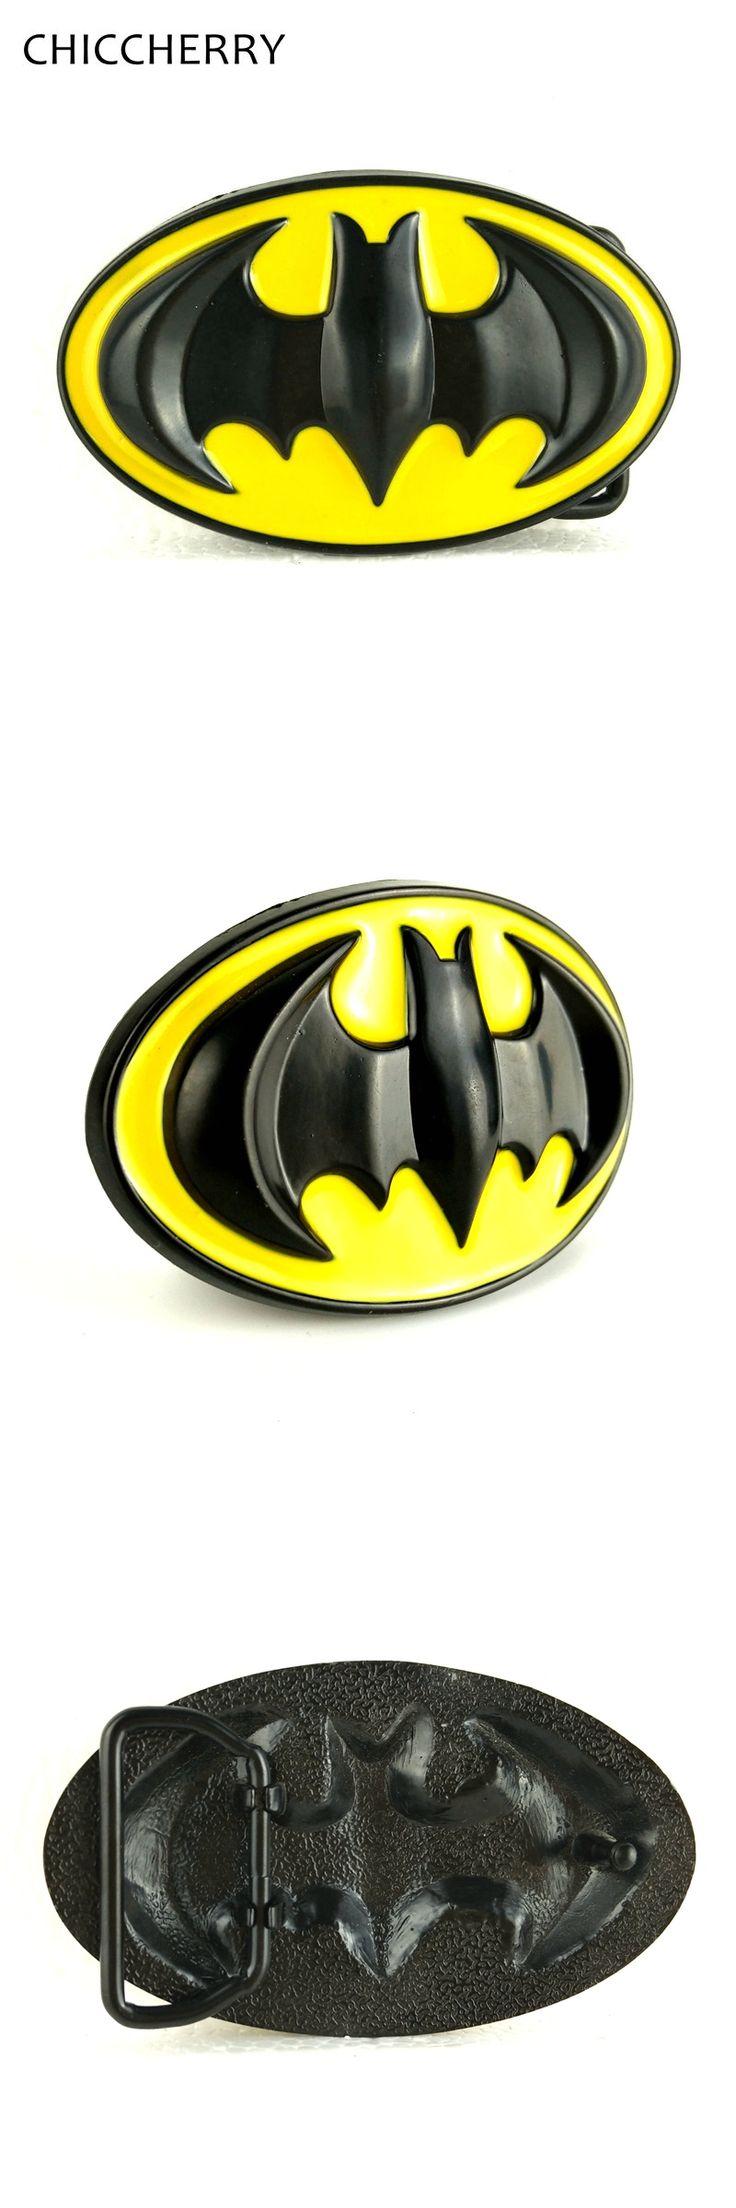 ONLY BUCKLE! Yellow And Black Batman Belt Buckle Metal 3D Hebillas Cinturon Fivela Cowboy Cool Fibbia for Mens Belts Accessories